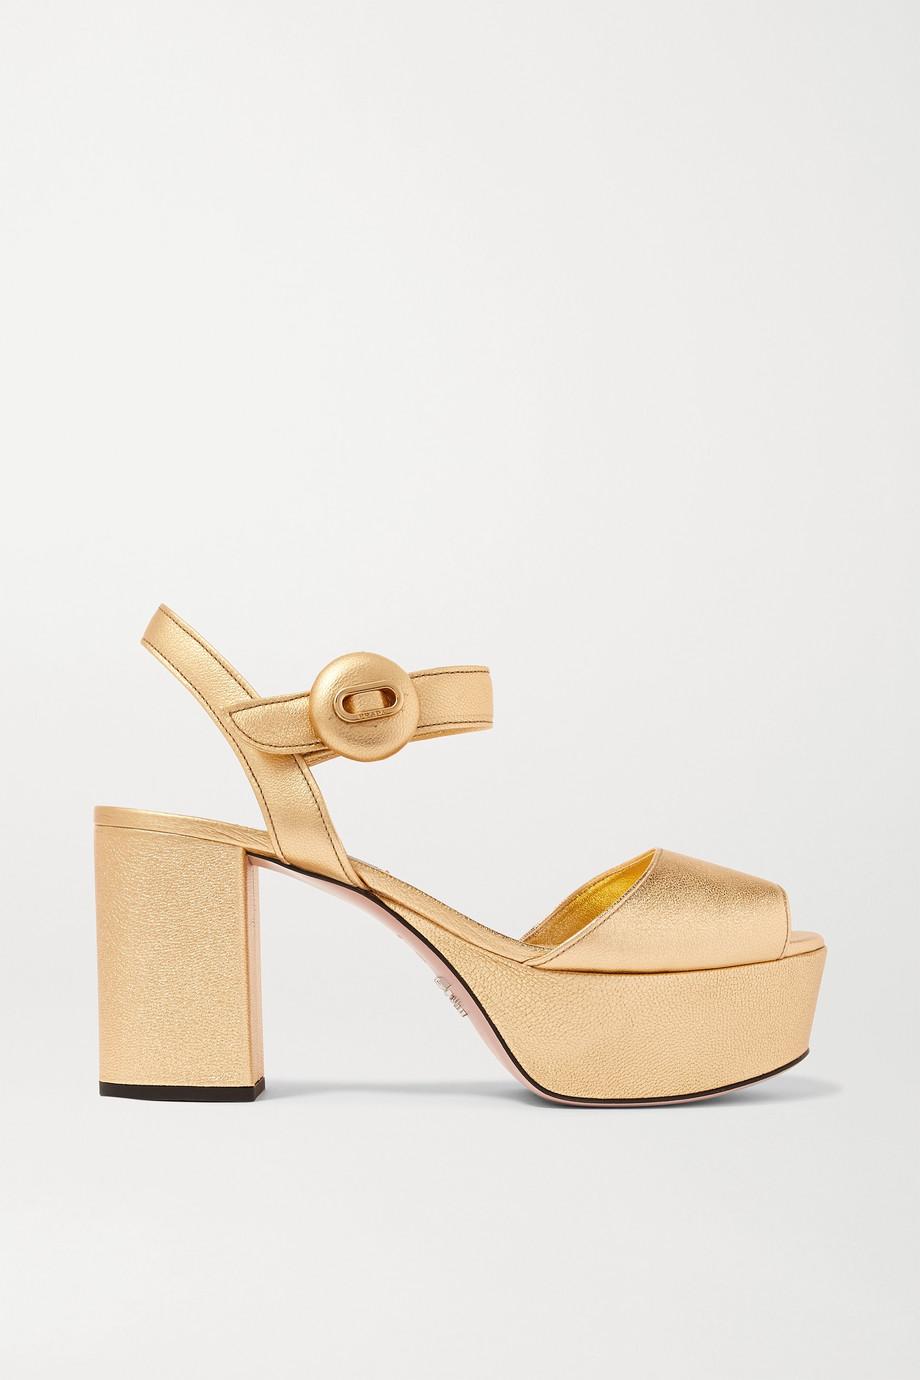 Prada 85 metallic textured-leather platform sandals